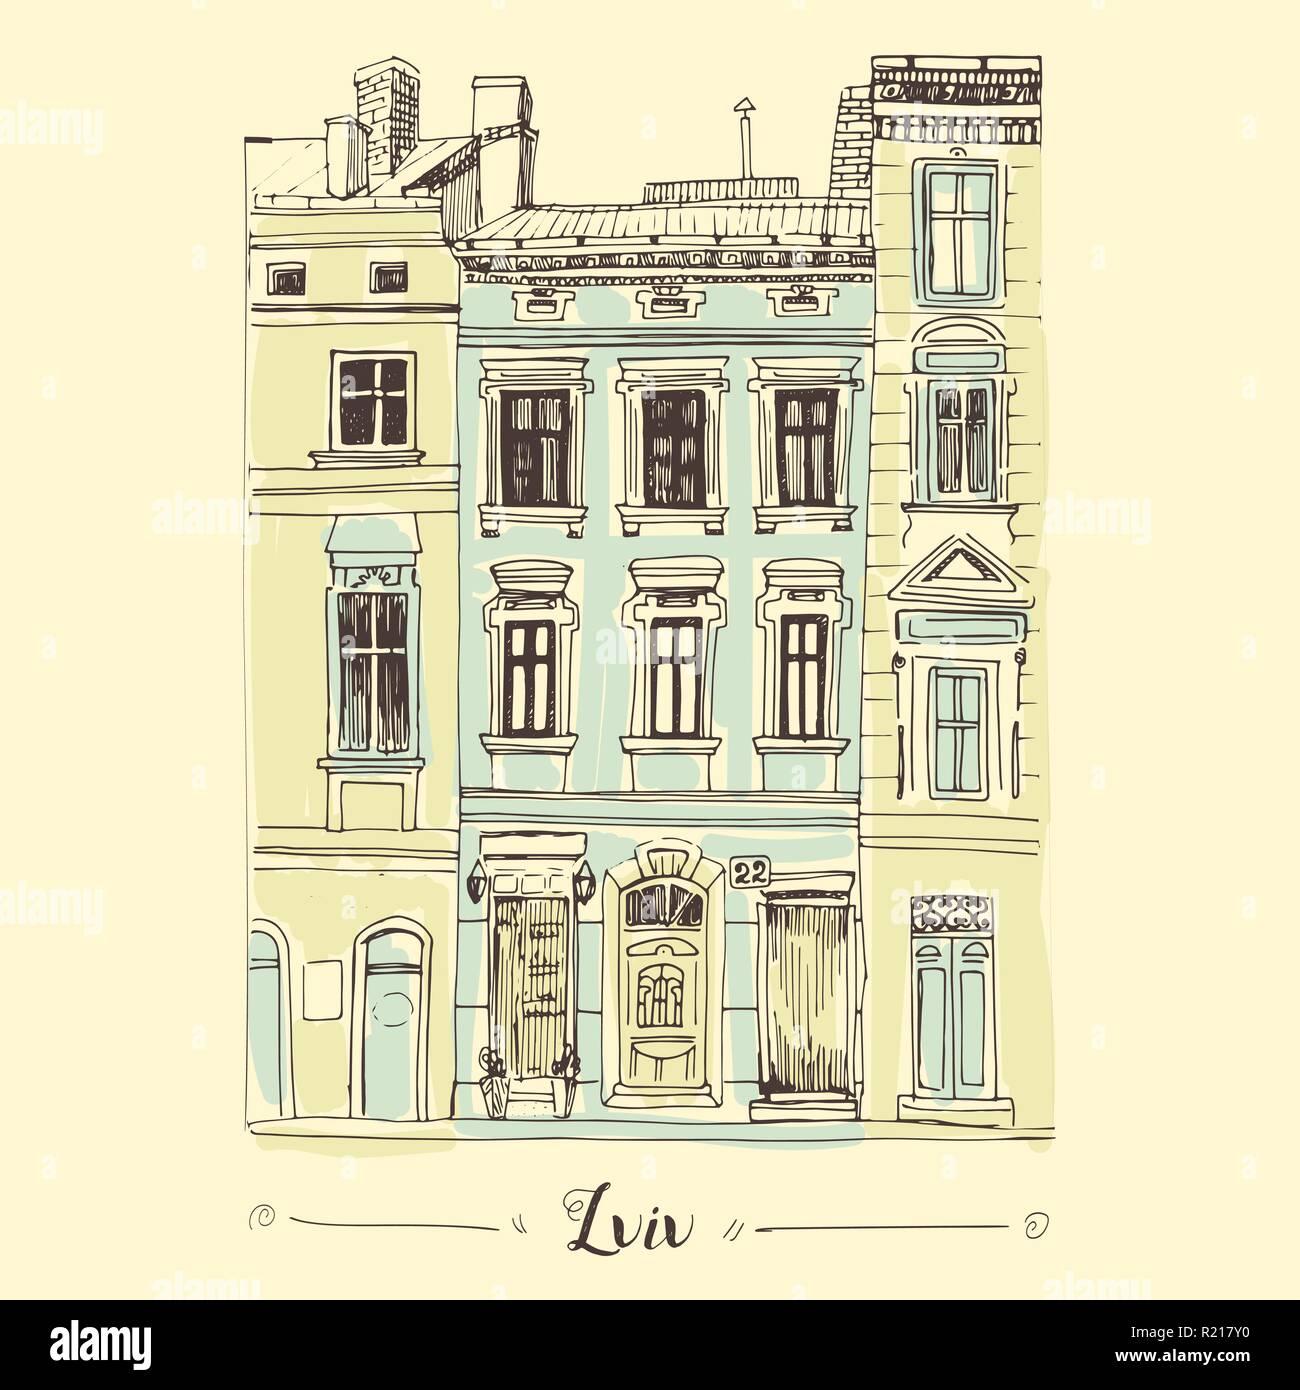 Lviv house hand drawn sketch. European old building for postcard design. - Stock Vector